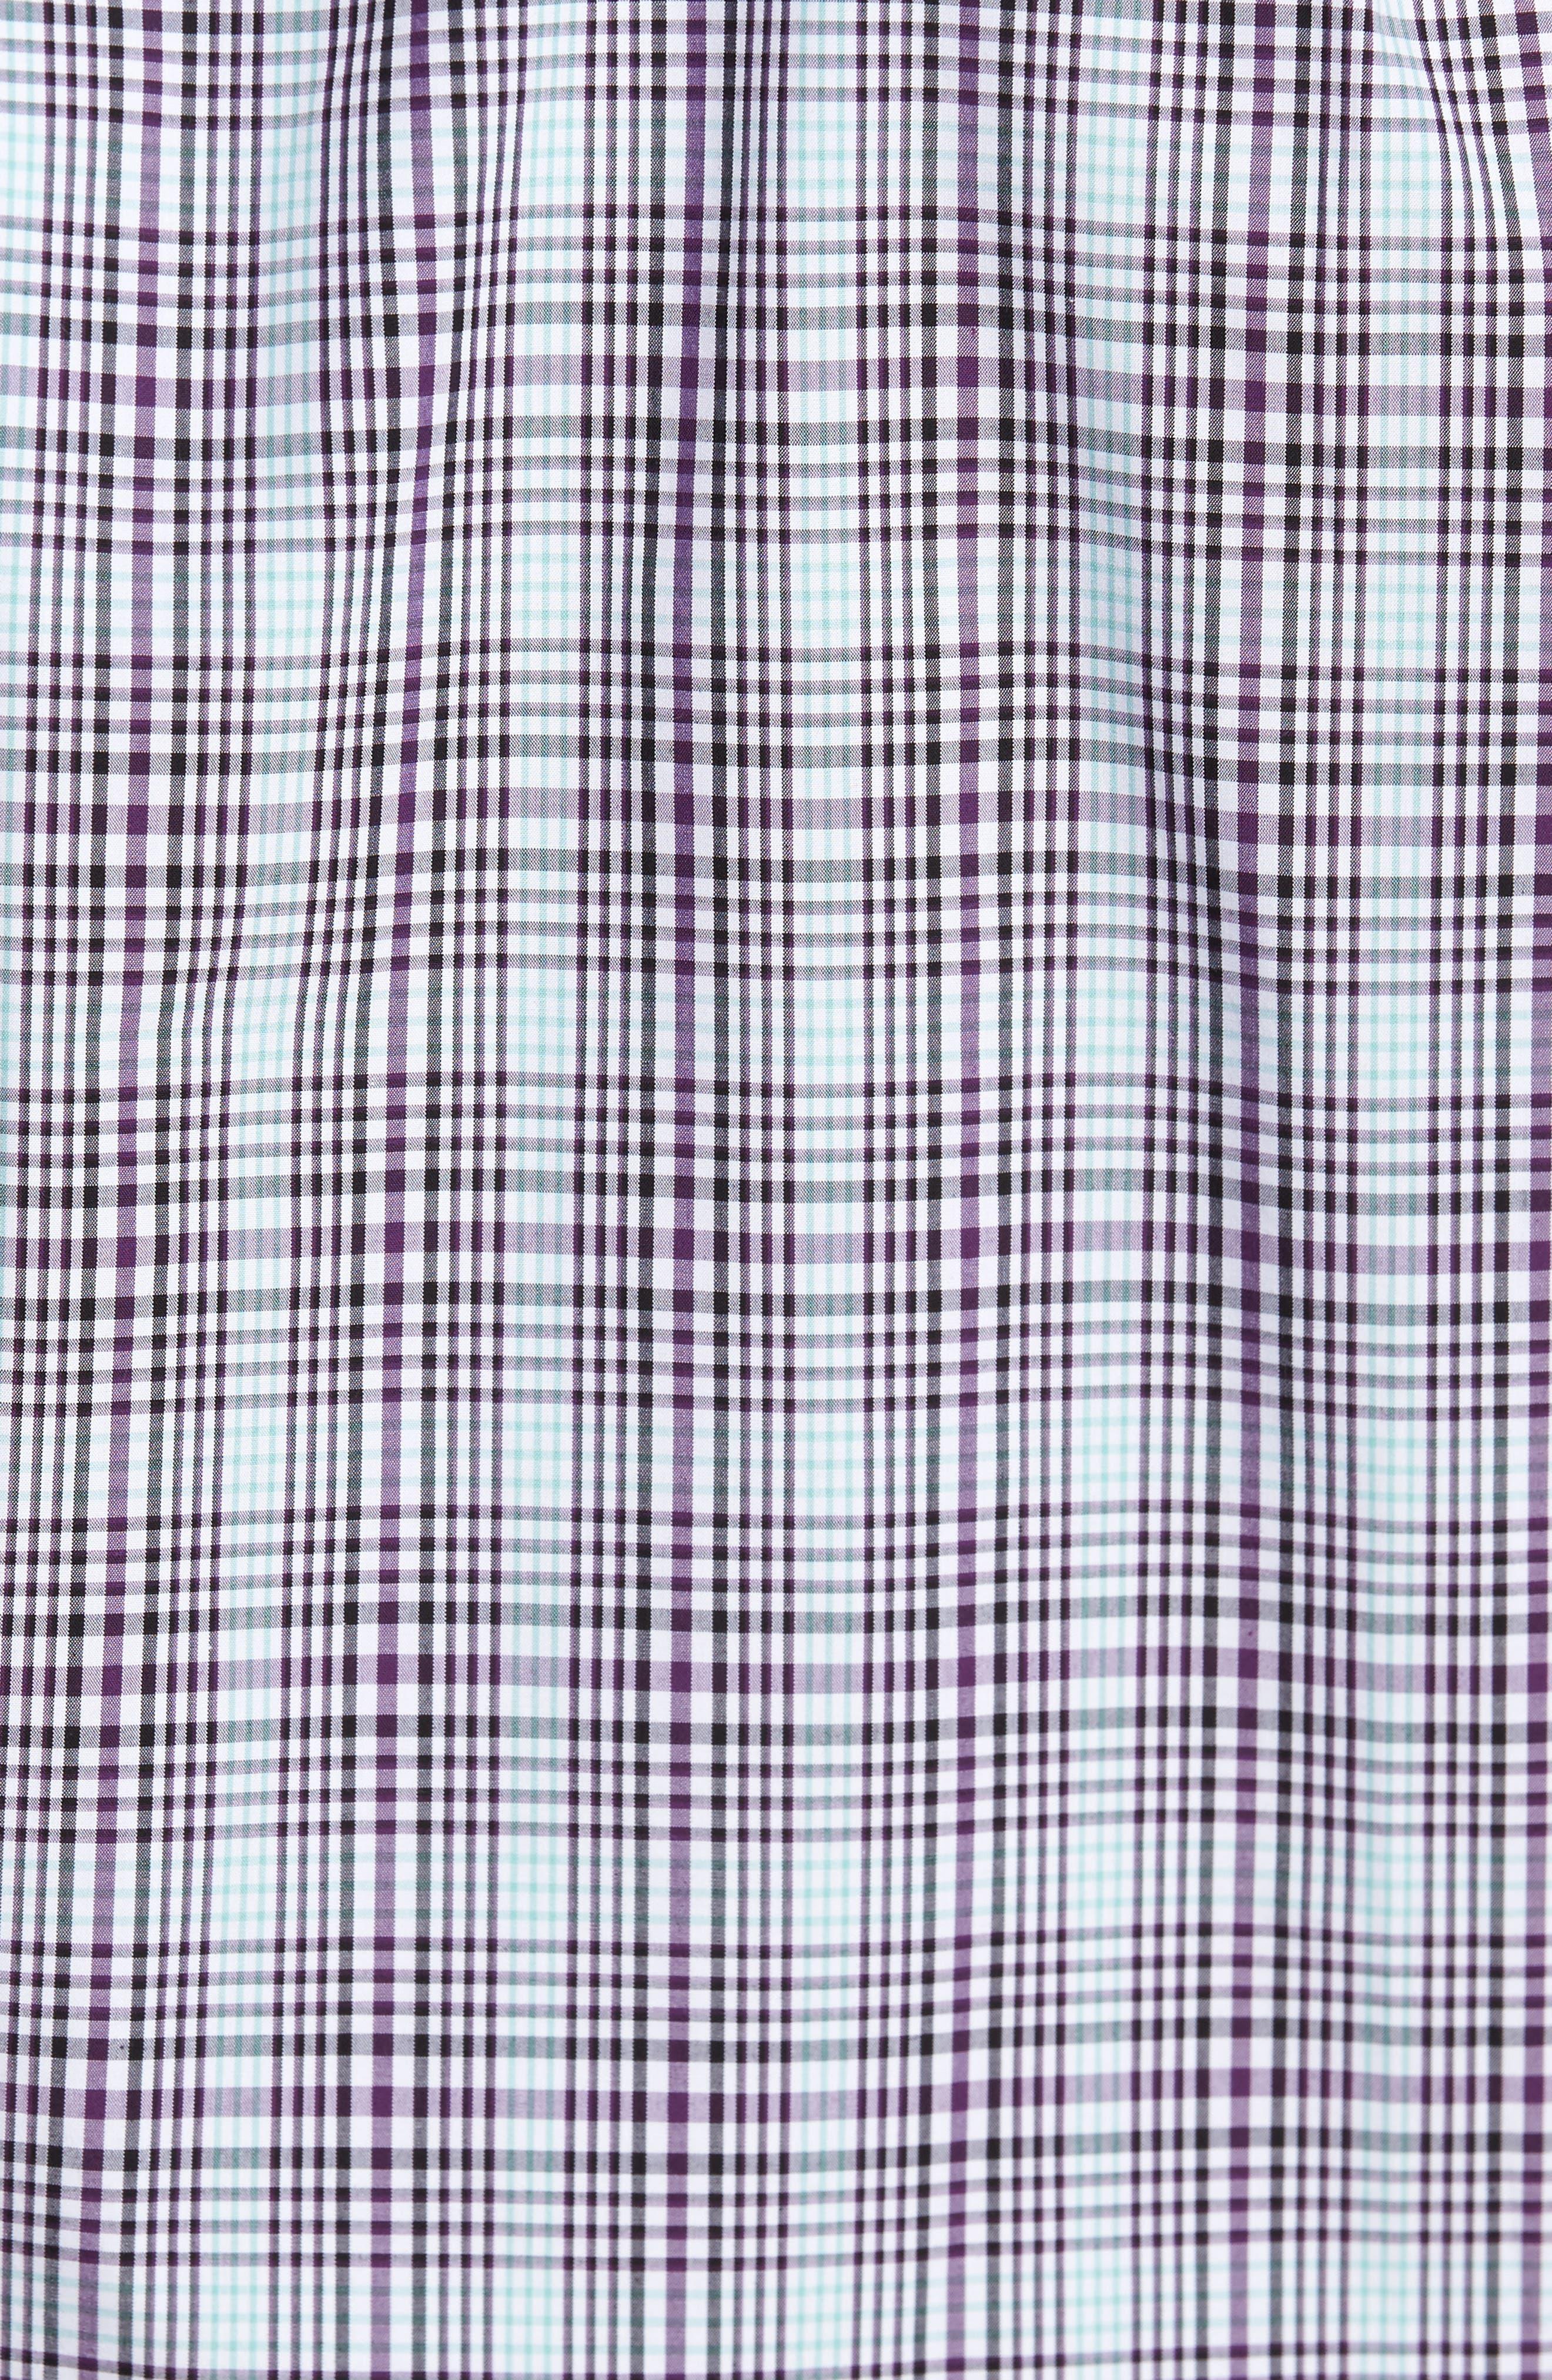 Hoyt Non-Iron Plaid Sport Shirt,                             Alternate thumbnail 5, color,                             522